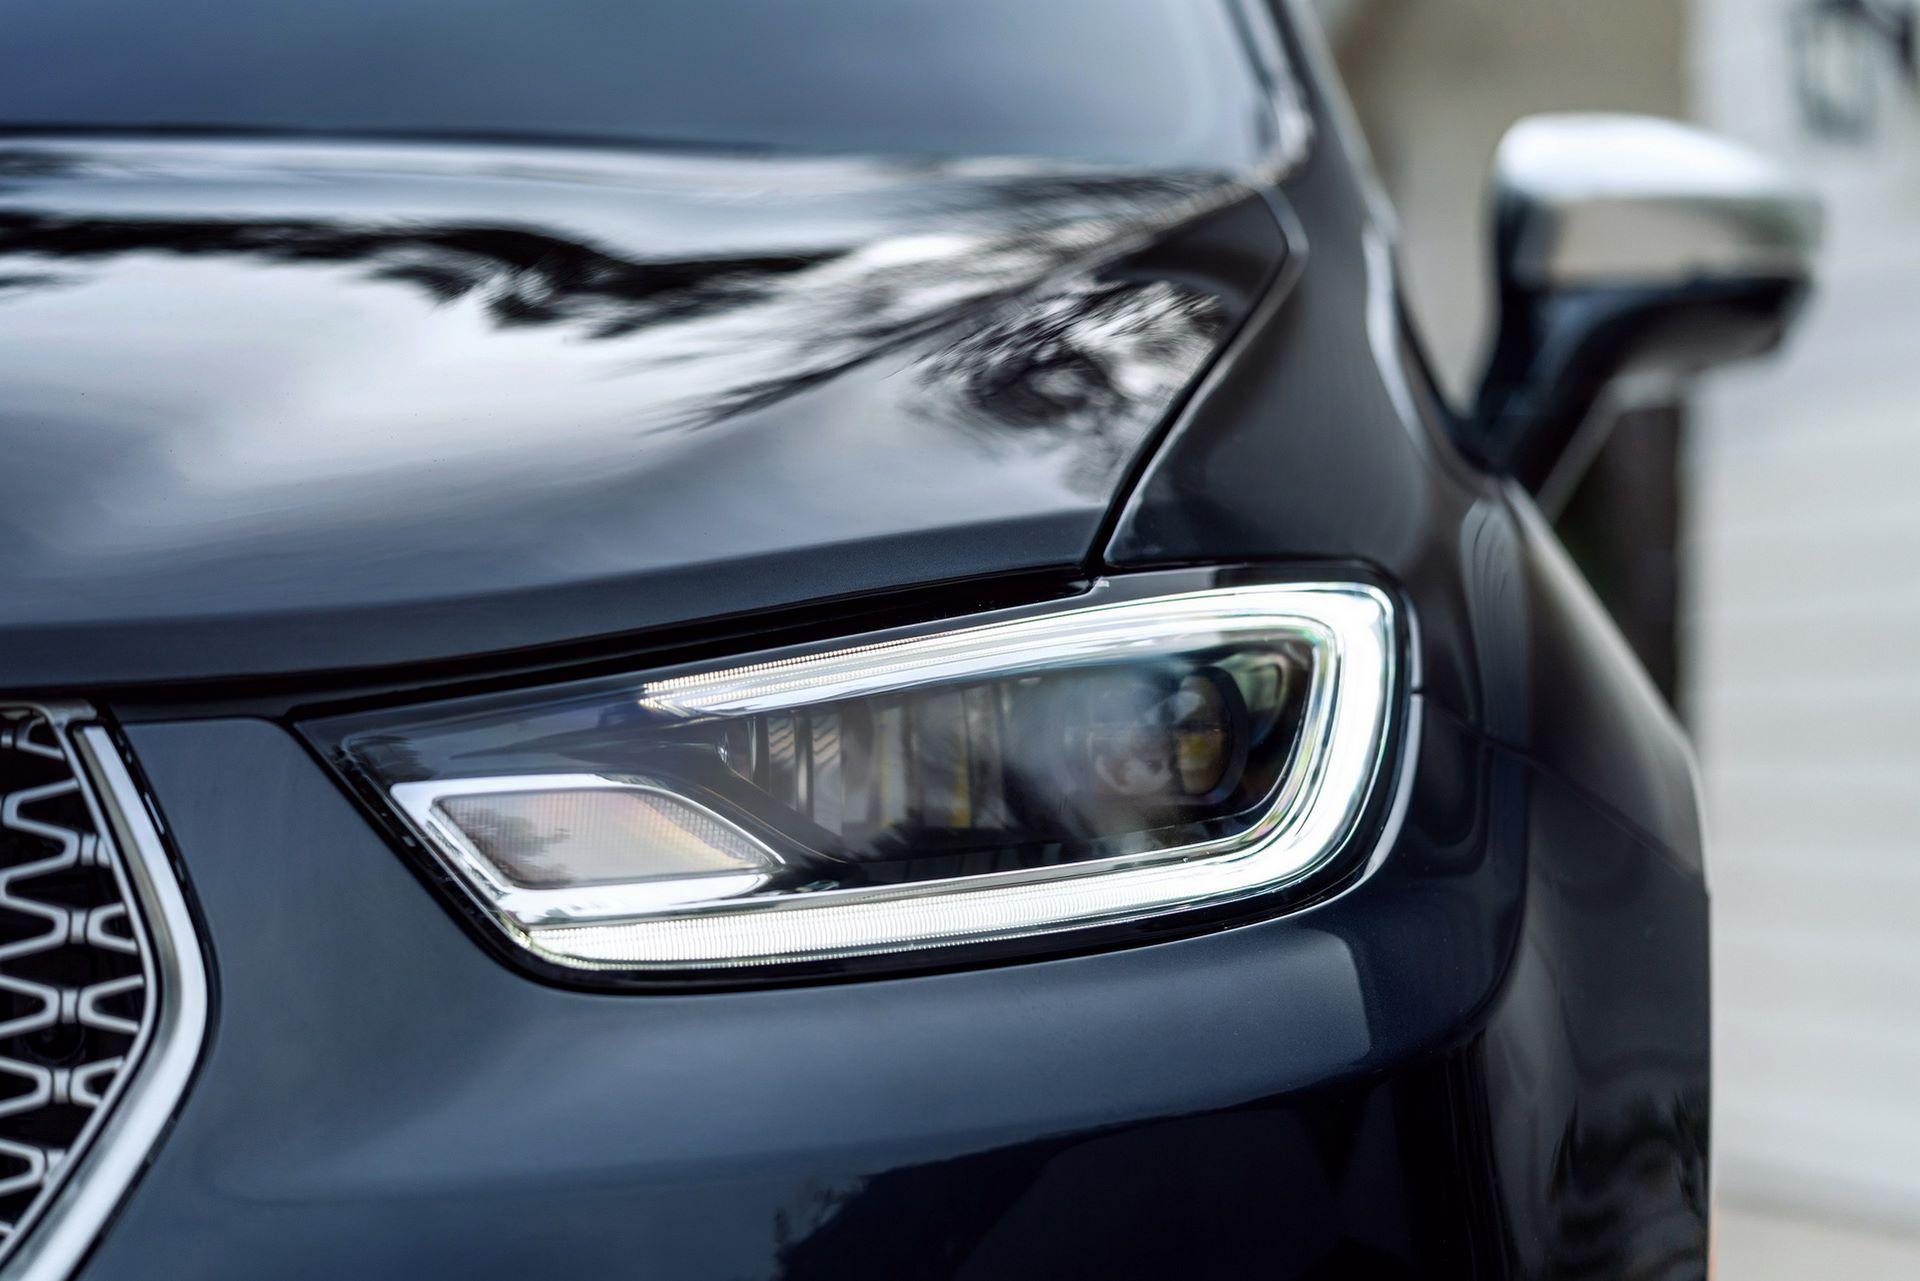 2021-Chrysler-Pacifica-26